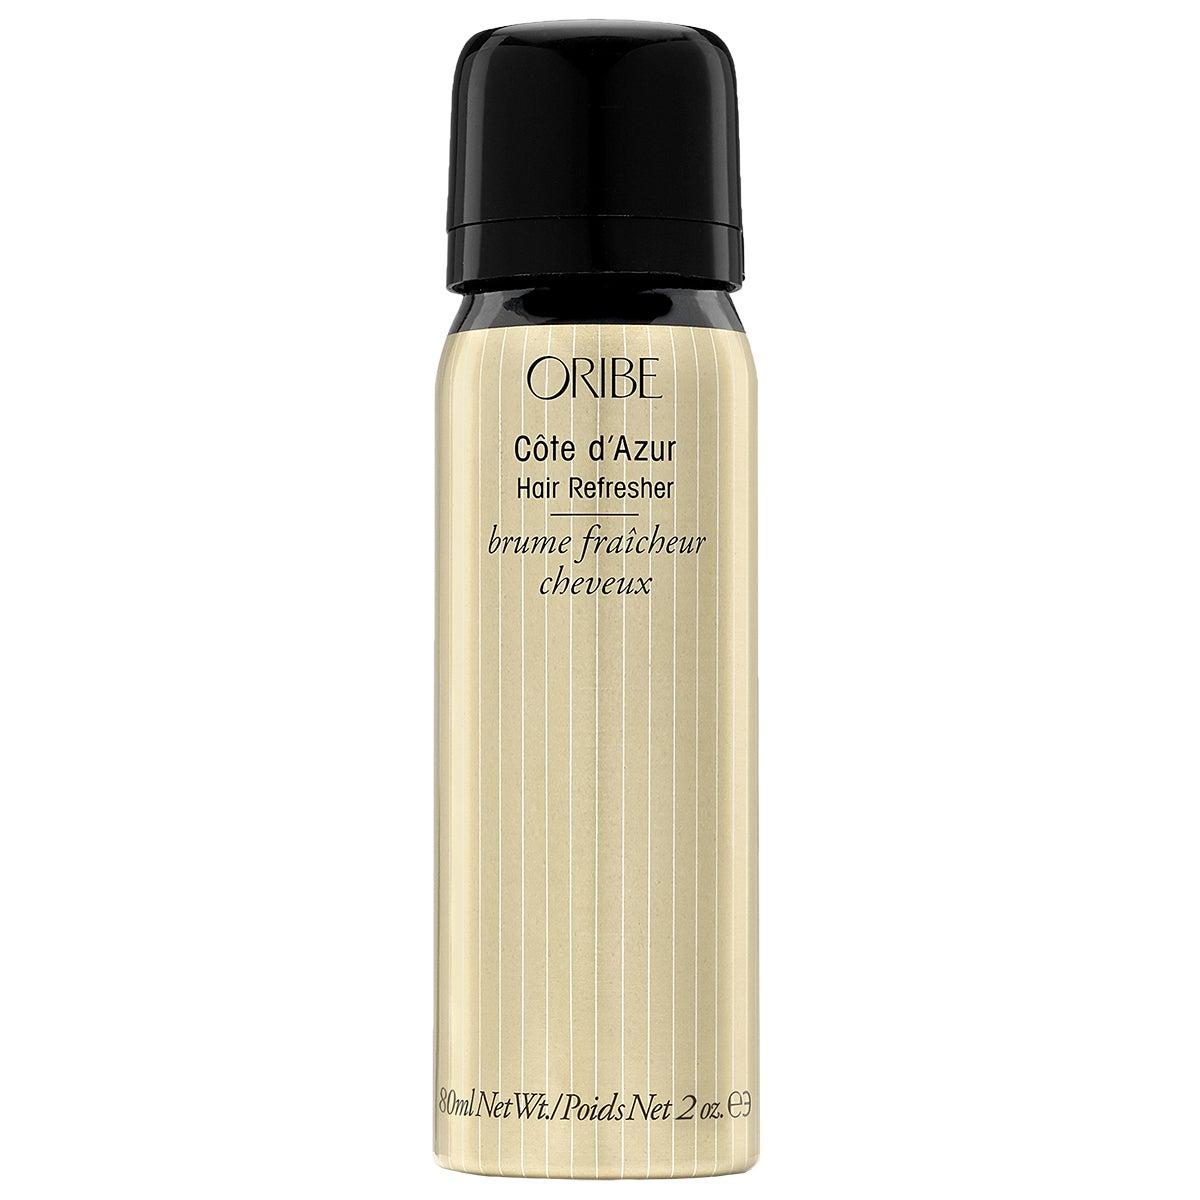 Côte d'Azur Hair Refresher 80 ml Oribe Hårparfym